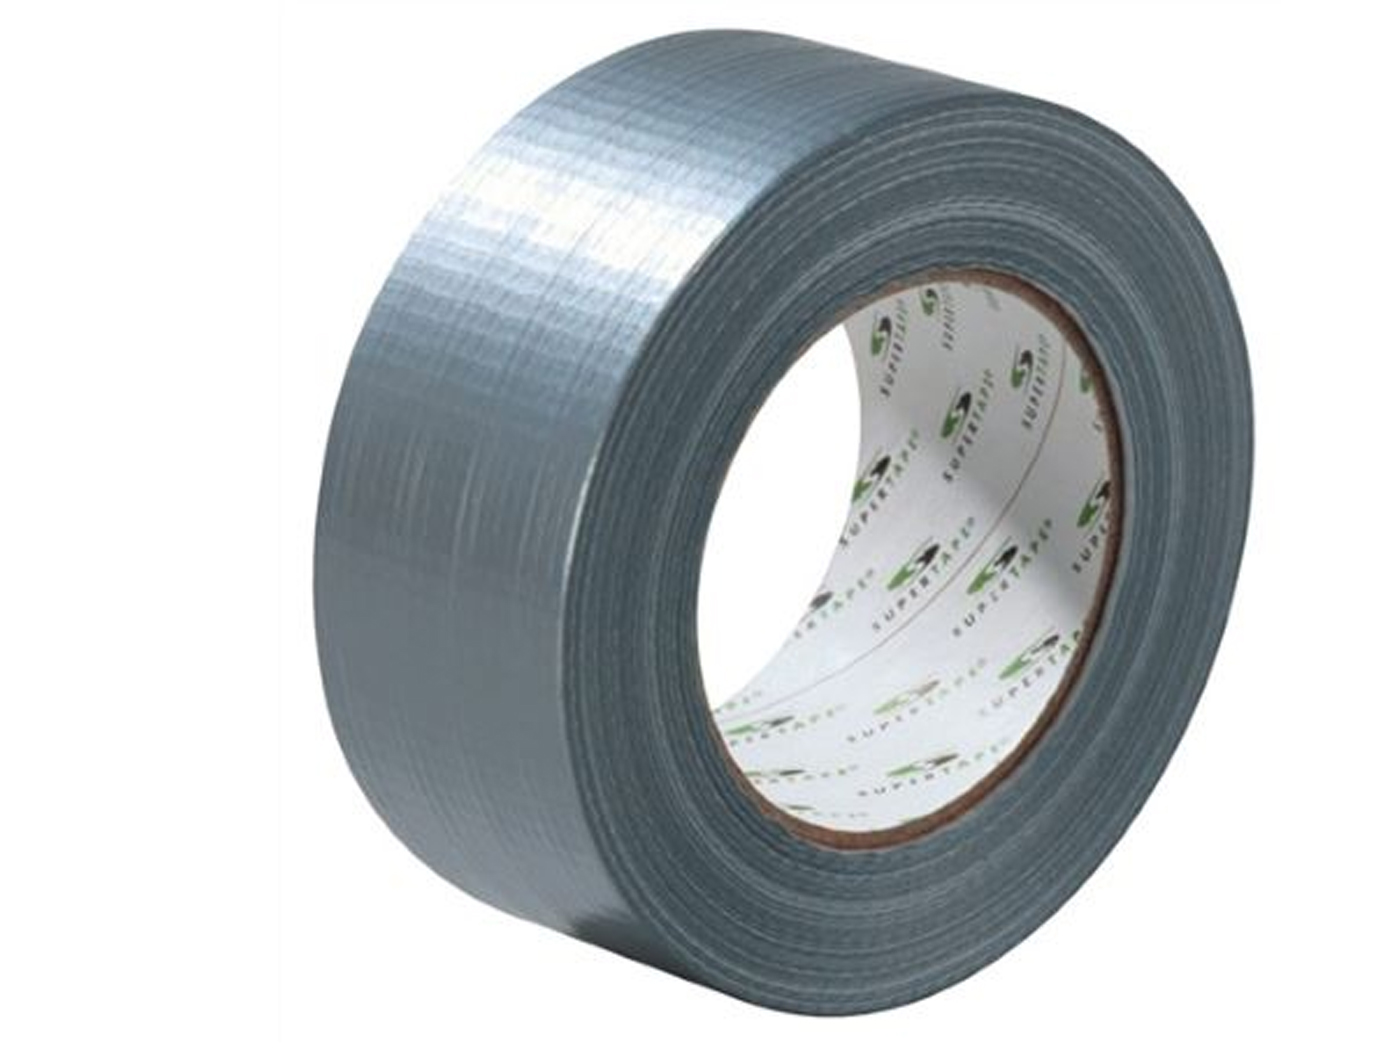 Tape Superduct ST201 zilver   DKMTools - DKM Tools